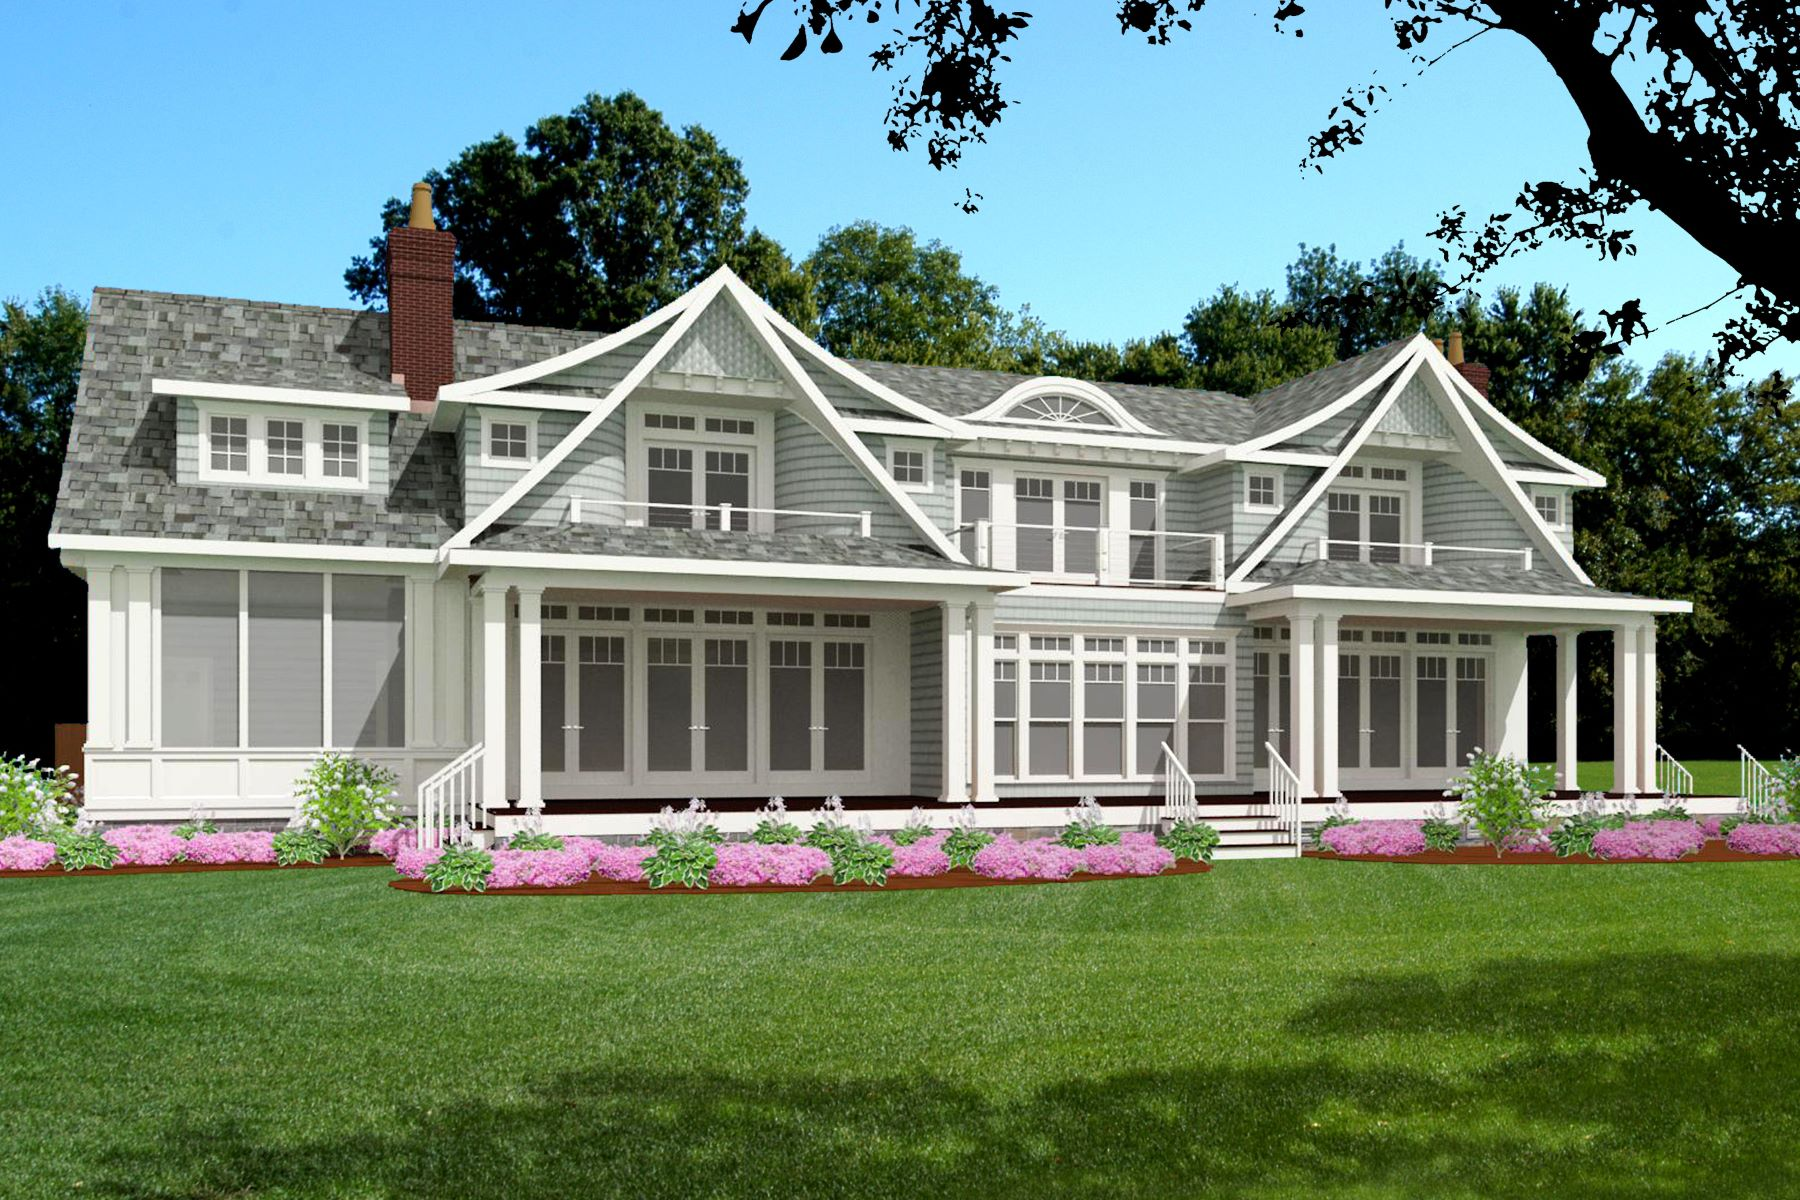 Single Family Homes для того Продажа на New Construction 63a Middle Beach Road, Madison, Коннектикут 06443 Соединенные Штаты